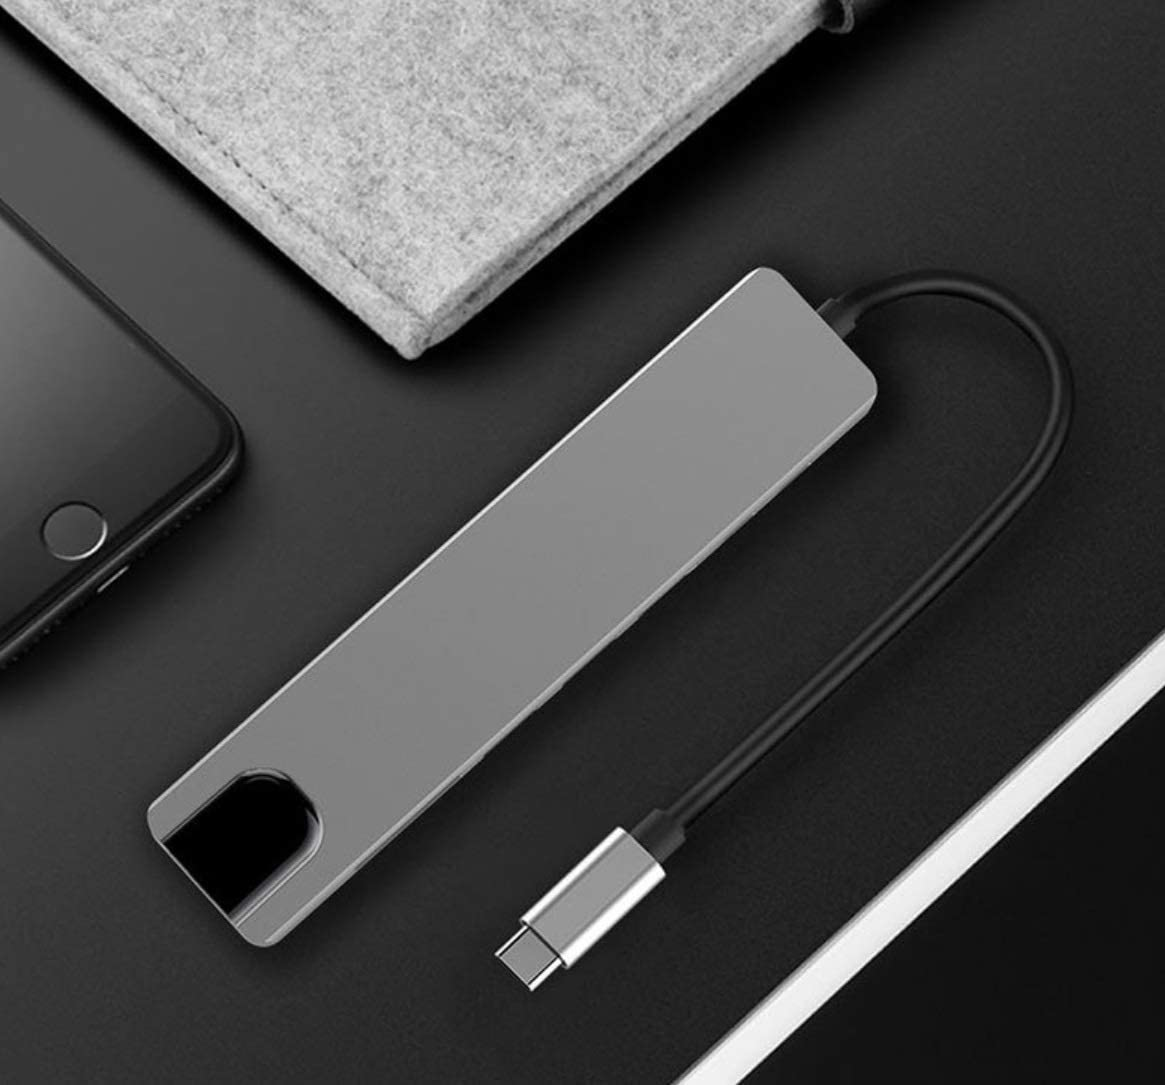 Hub USB Type-c cho Samsung Dex, Macbook - HDMI, Ethernet, USB3.0, Type-c